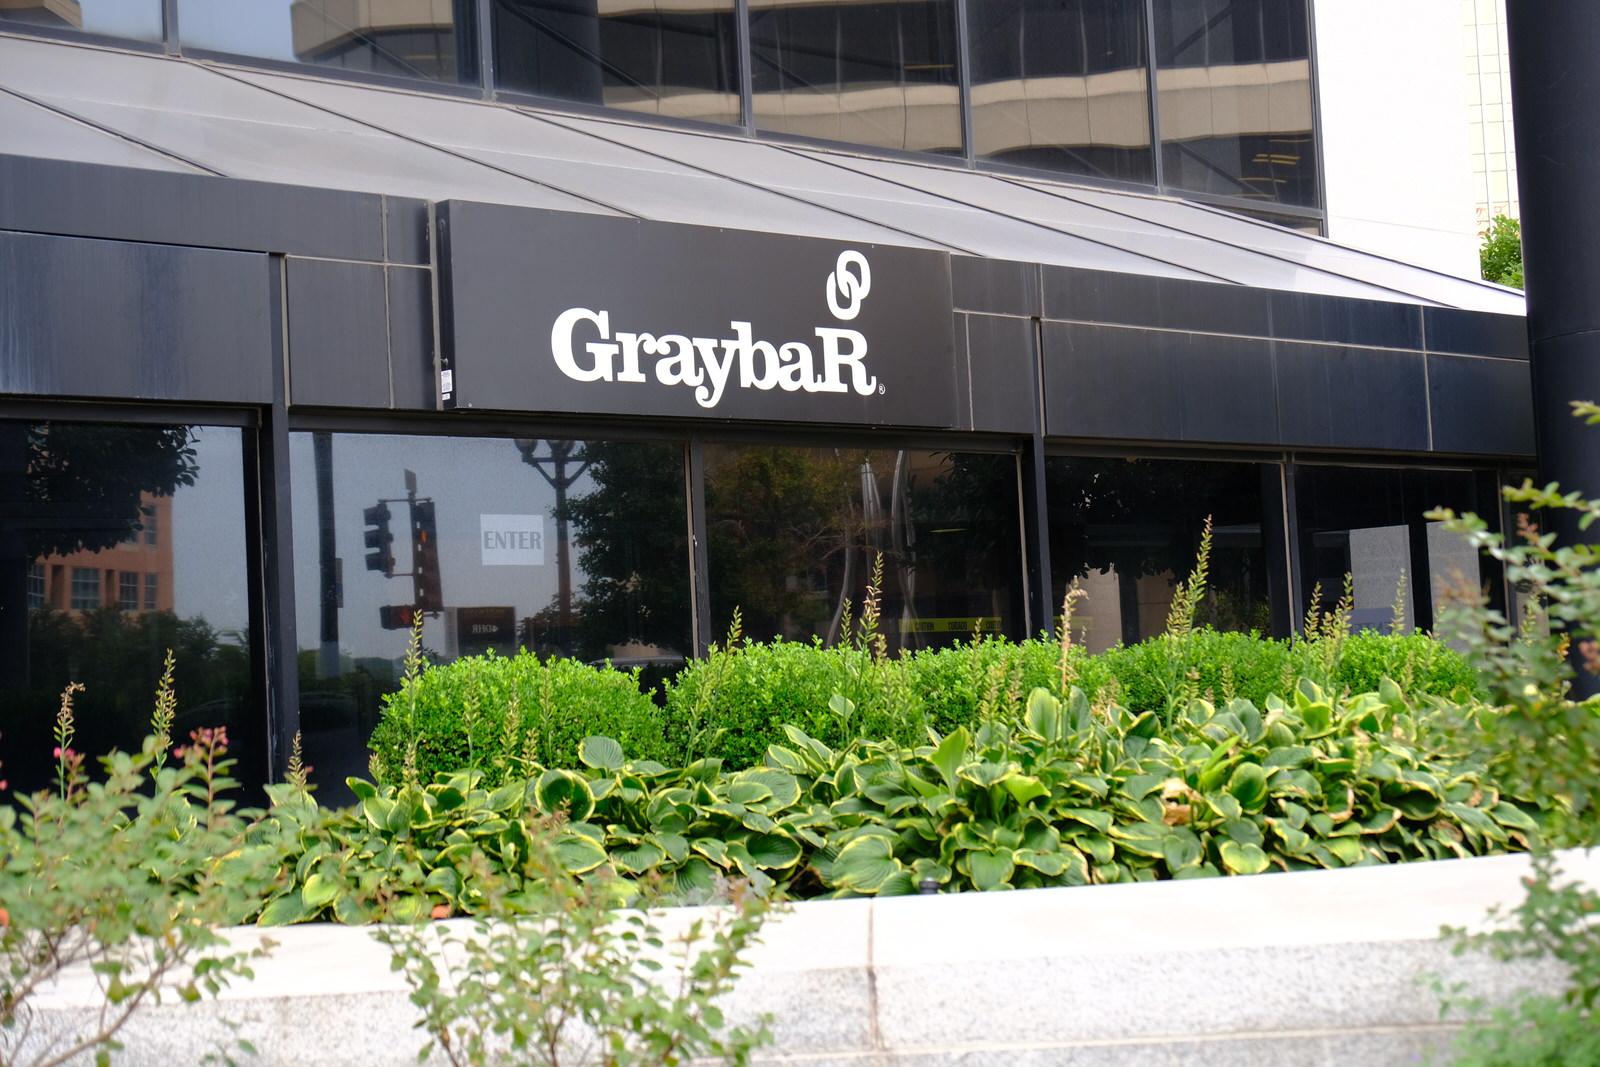 Graybar Electric's corporate headquarters in St. Louis, Missouri.